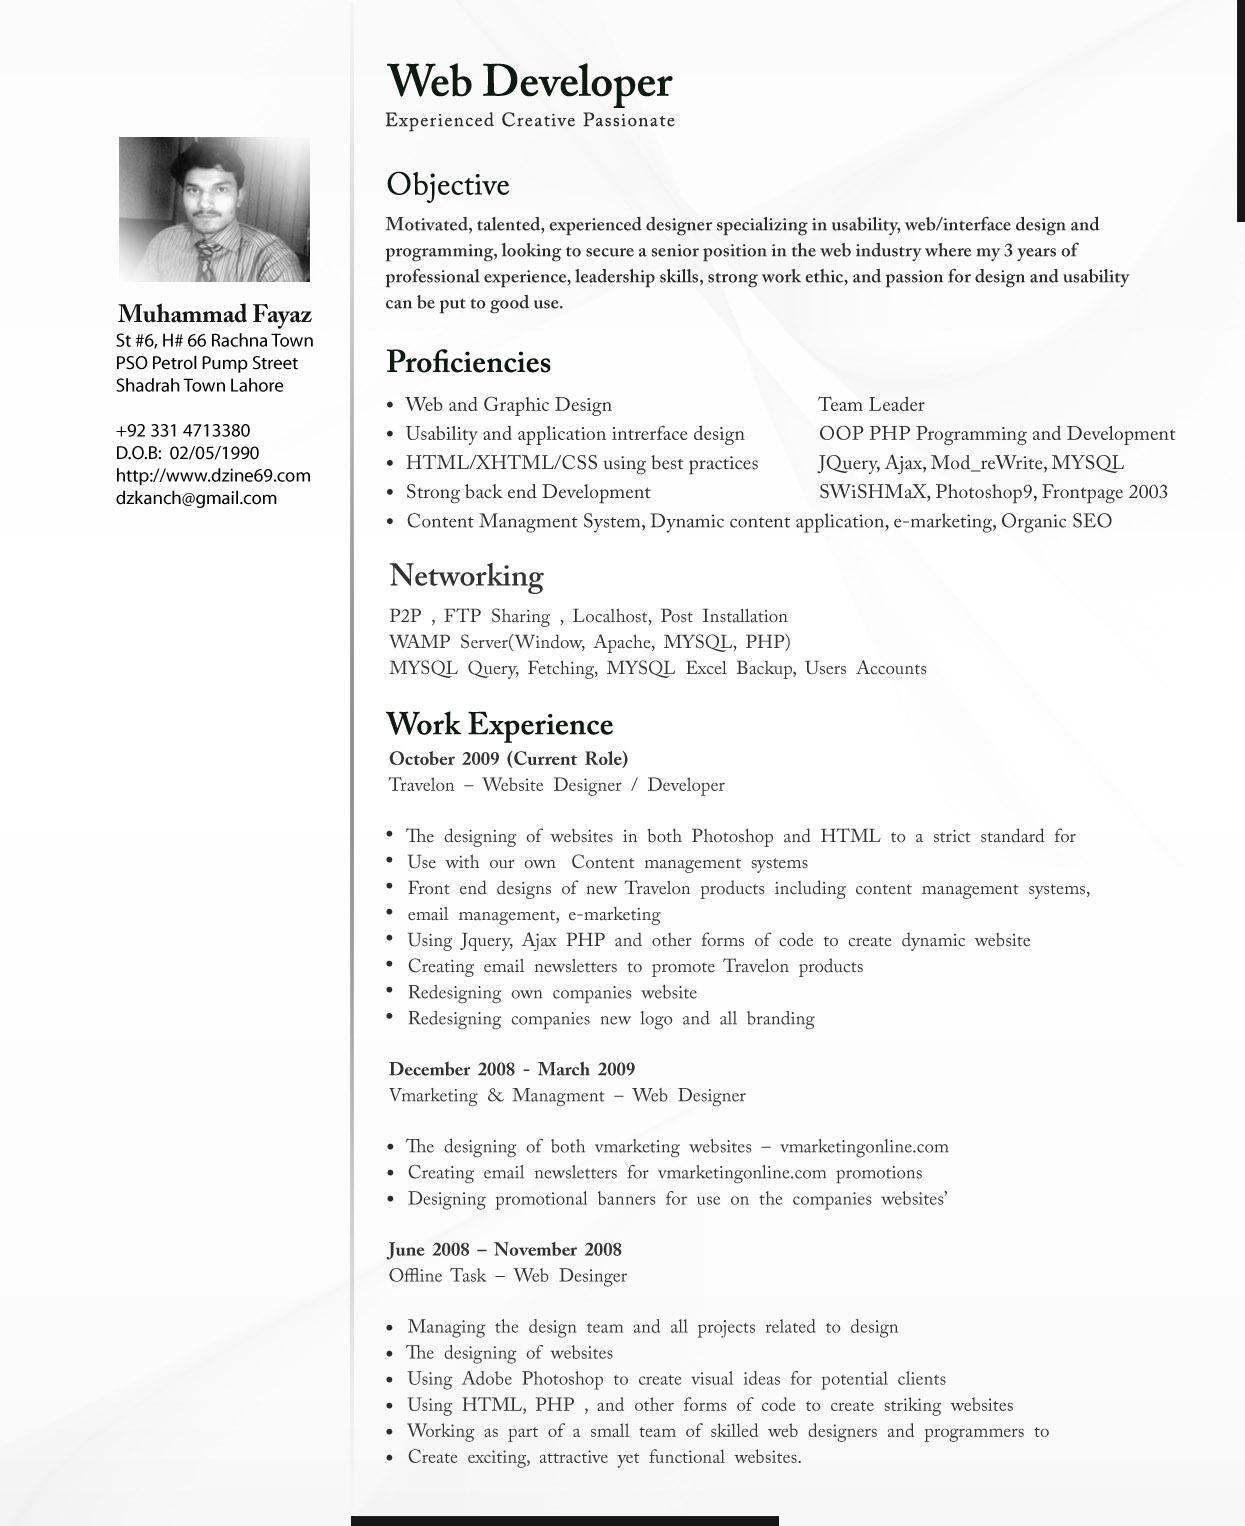 CV - Professional by dzkanch